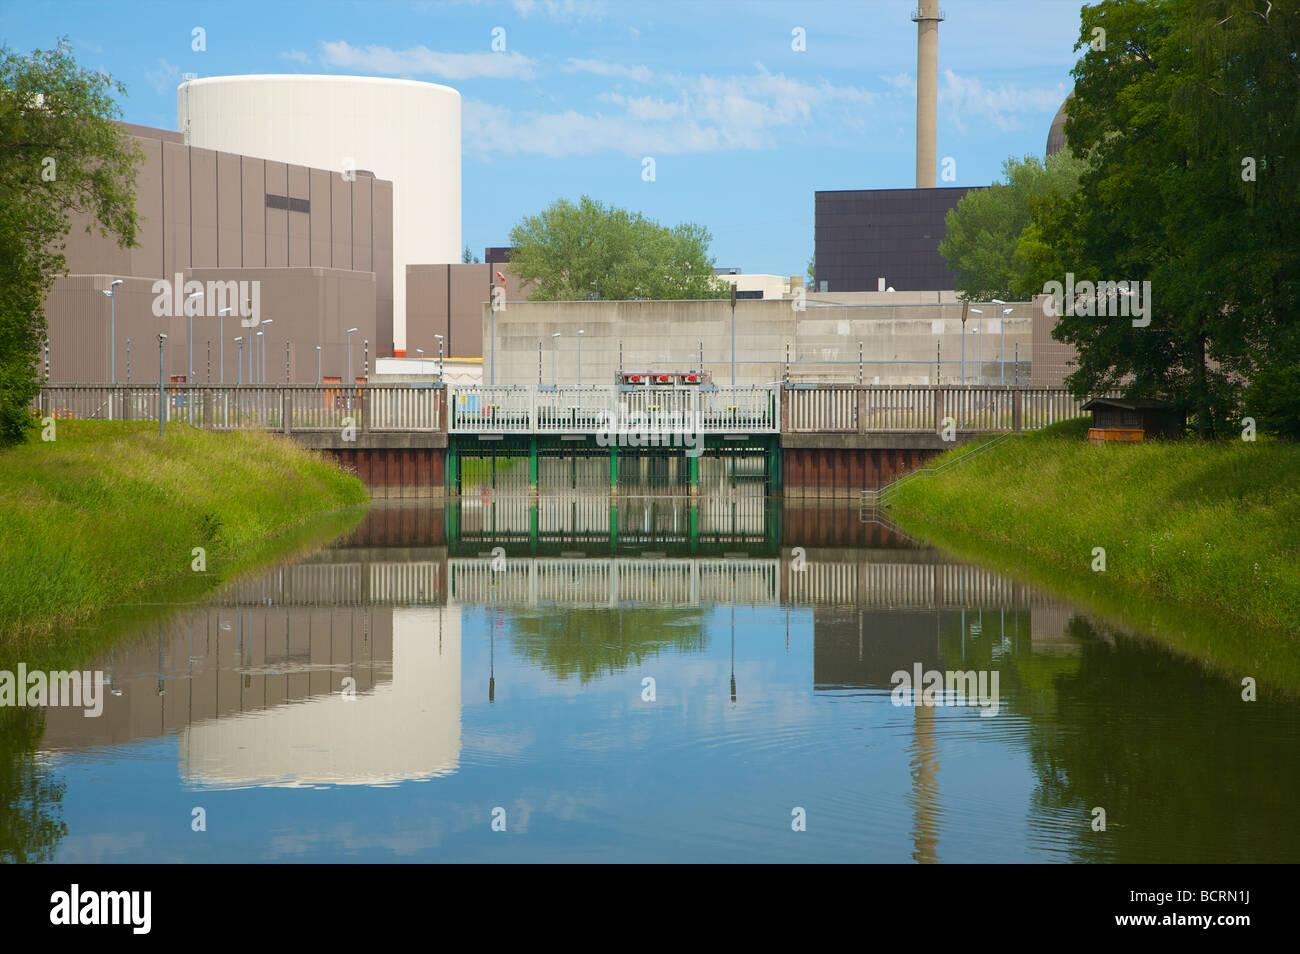 Gundremmingen nuclear power plant in Bavaria, Germany. Cooling water intake from the Danube river. Kernkraftwerk Stock Photo